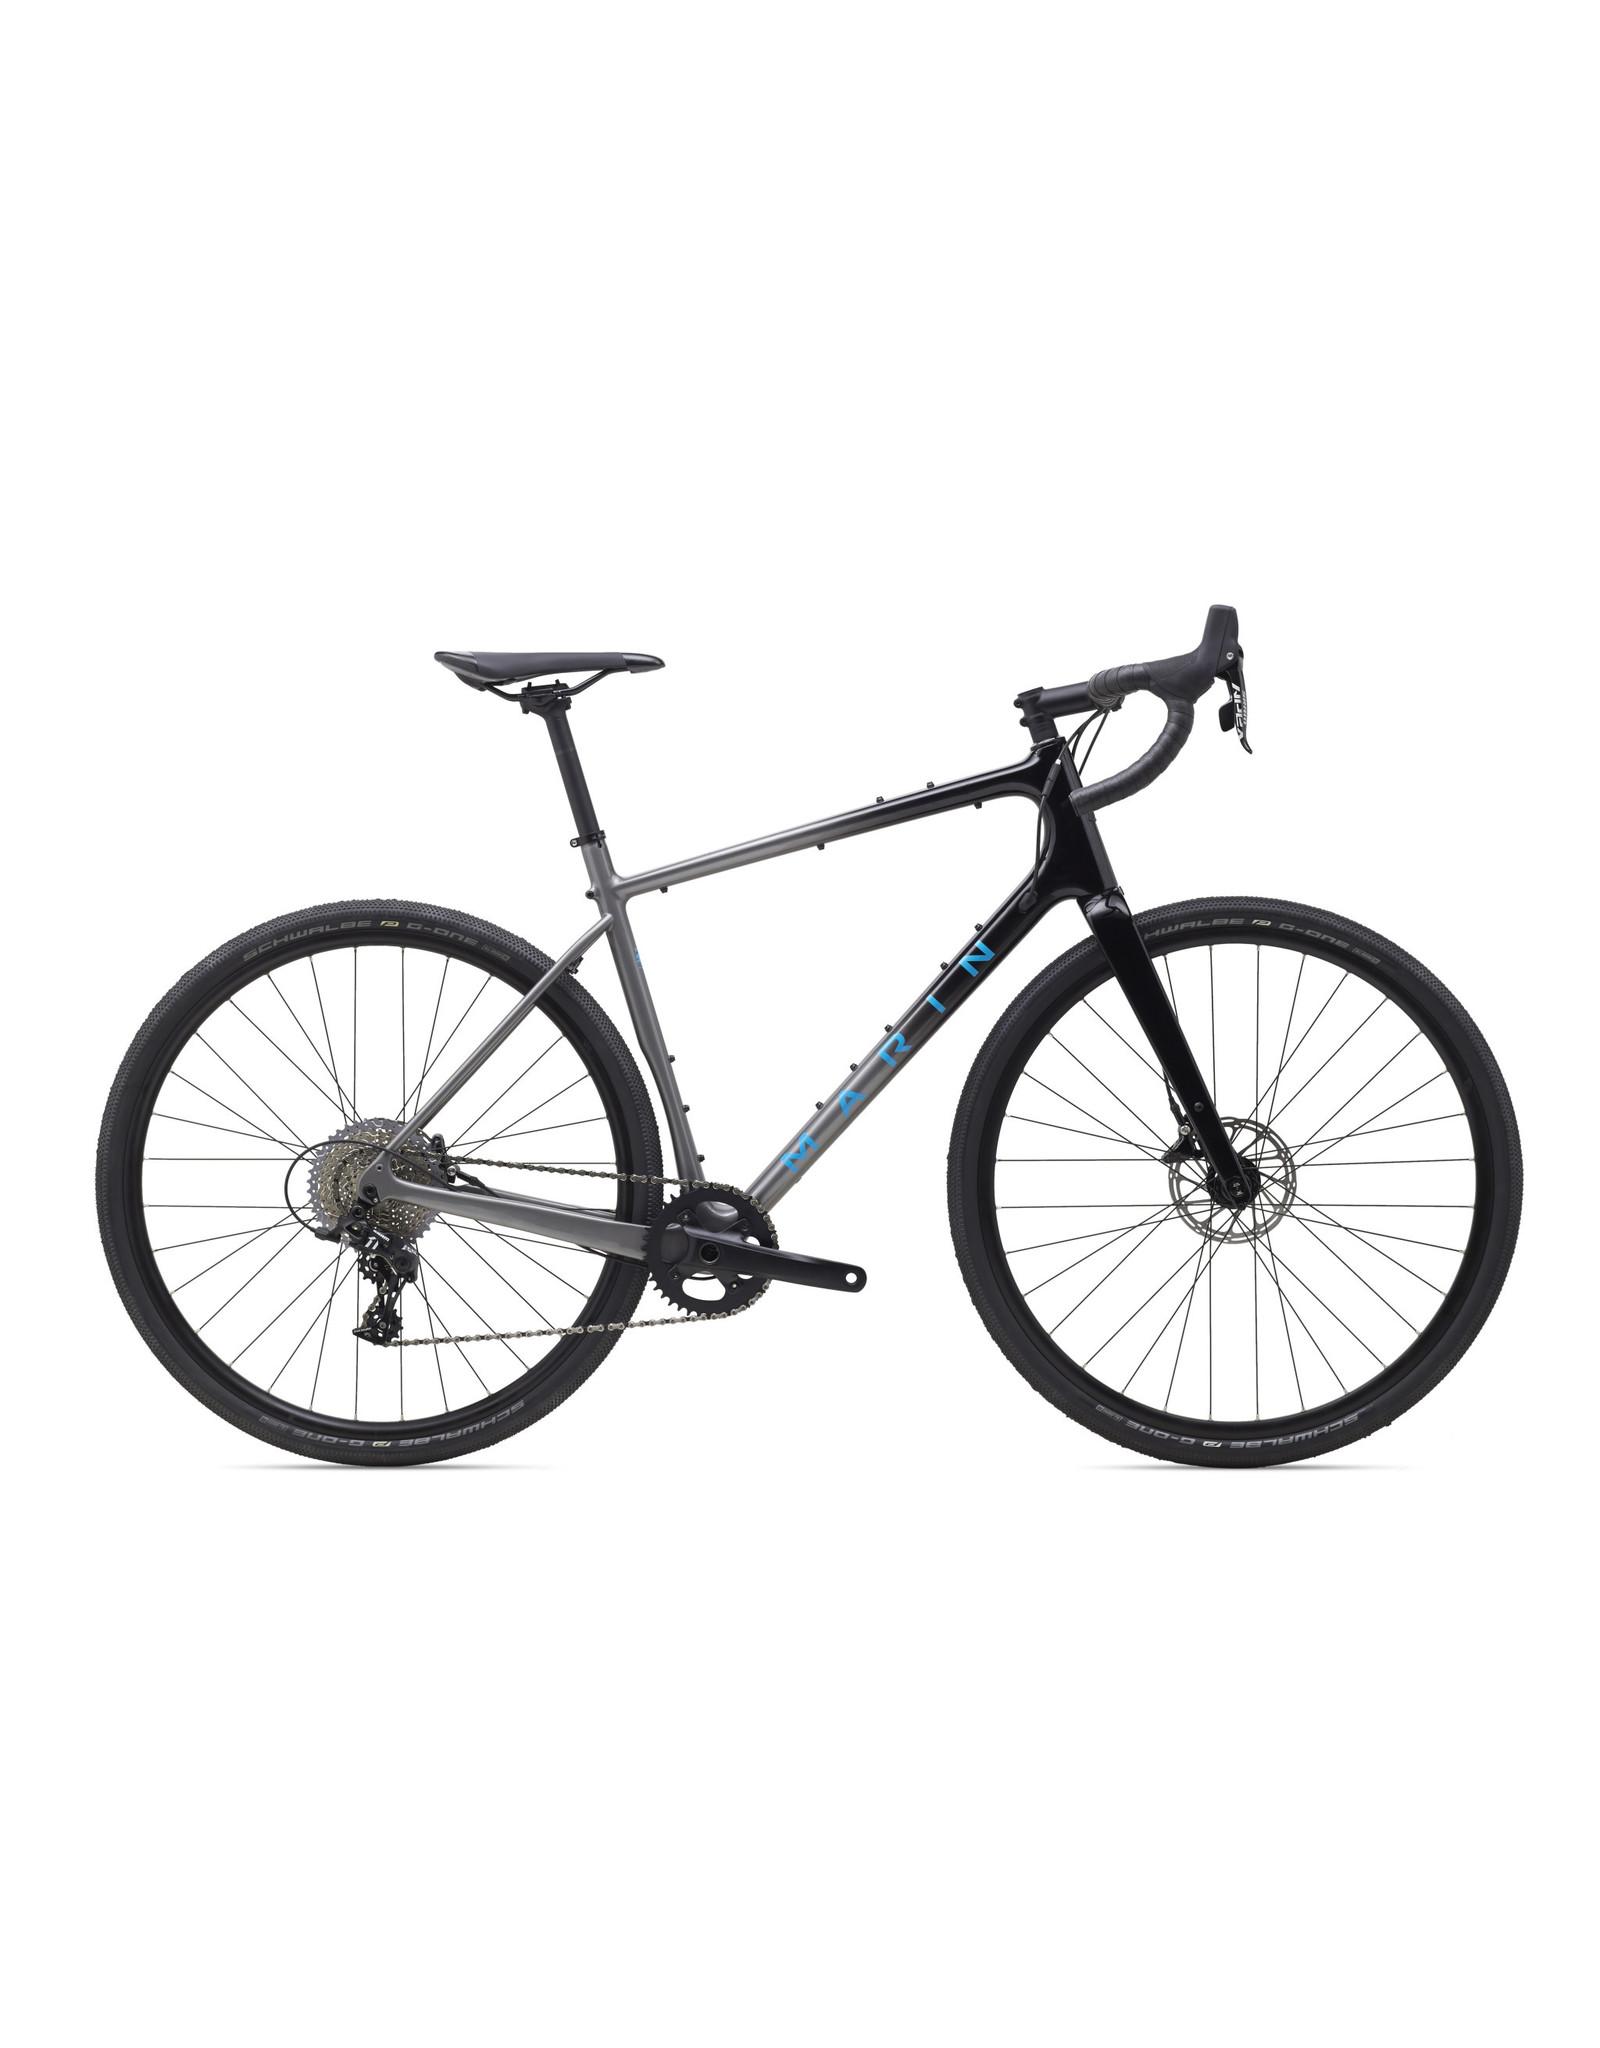 Marin Bikes 2020 Marin Headlands 1